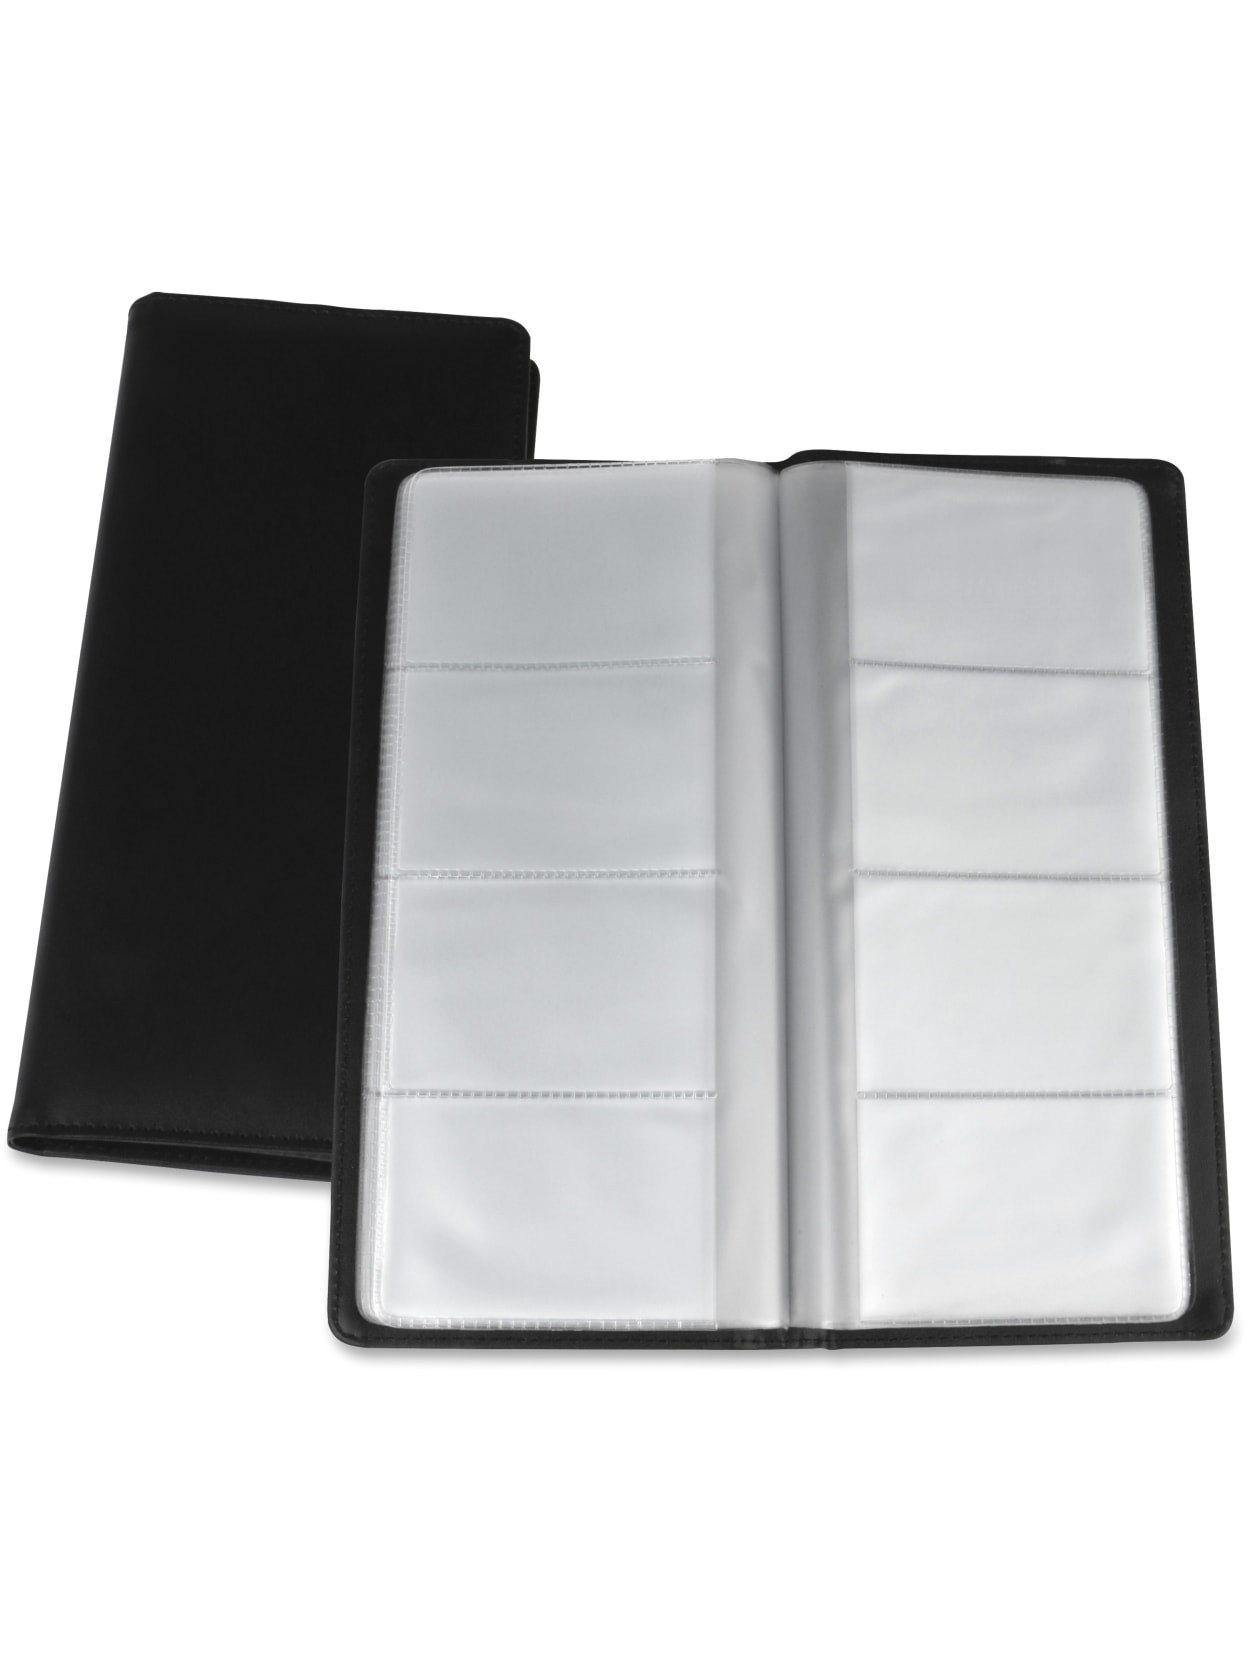 Modern Desktop Business Card Holder Lorell Business Card Storage Holder 0 8 X 4 4 X 9 Vinyl Plastic 1 Each Black Clear Item 883227